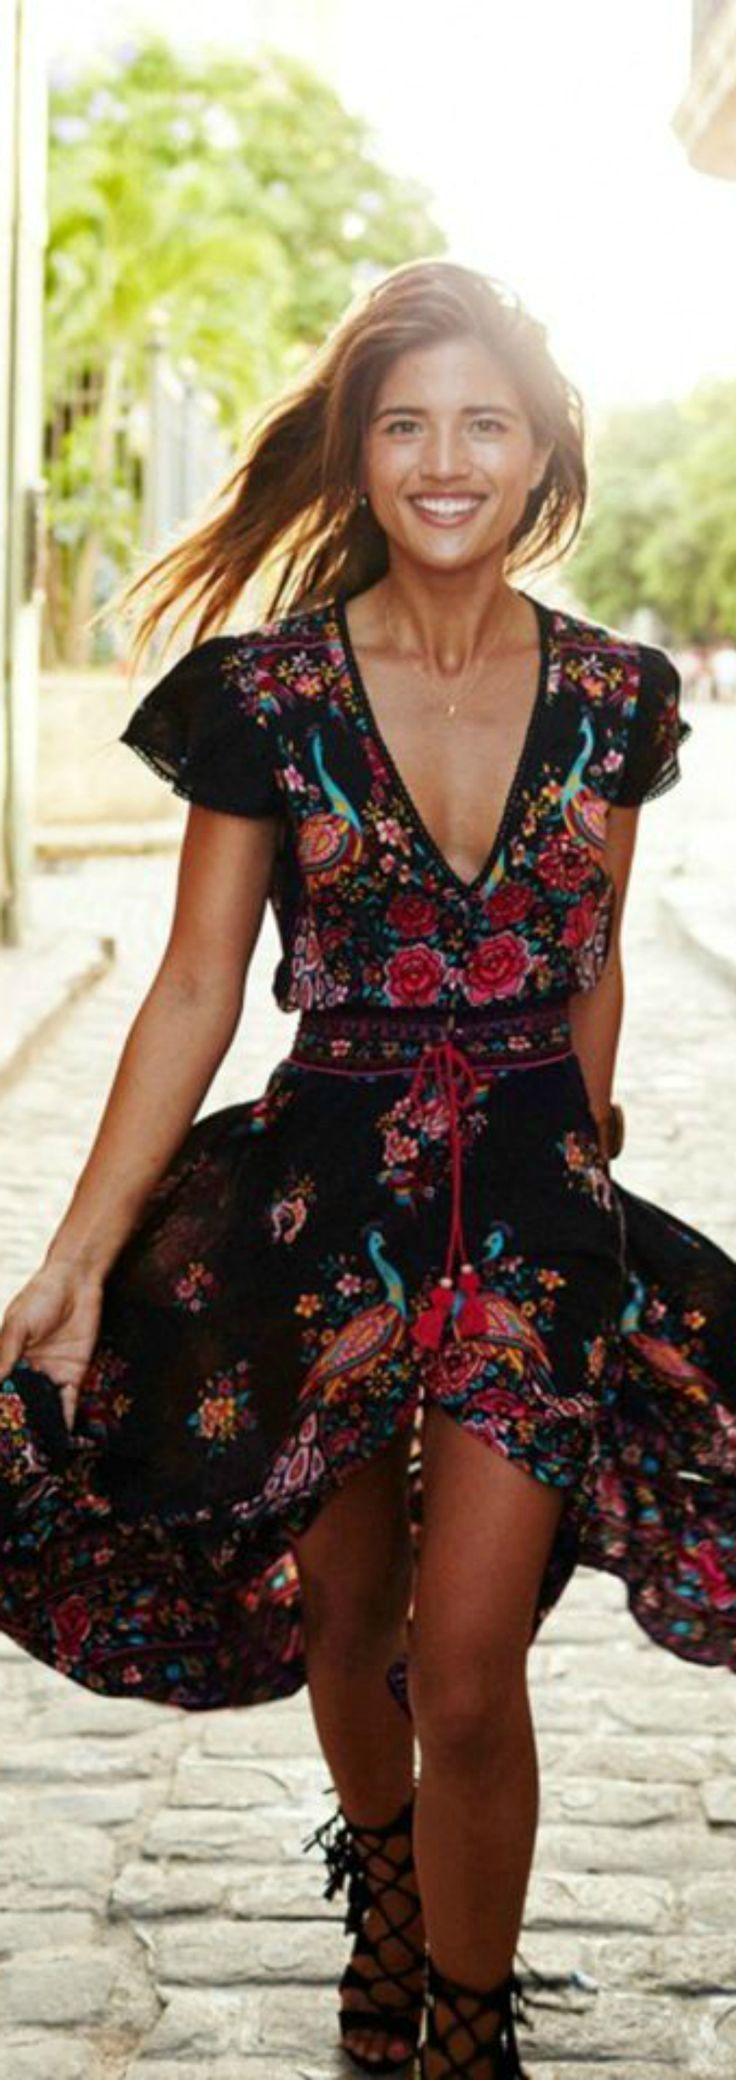 flores women 39 s fashion boho kleid hochzeit gast boho. Black Bedroom Furniture Sets. Home Design Ideas